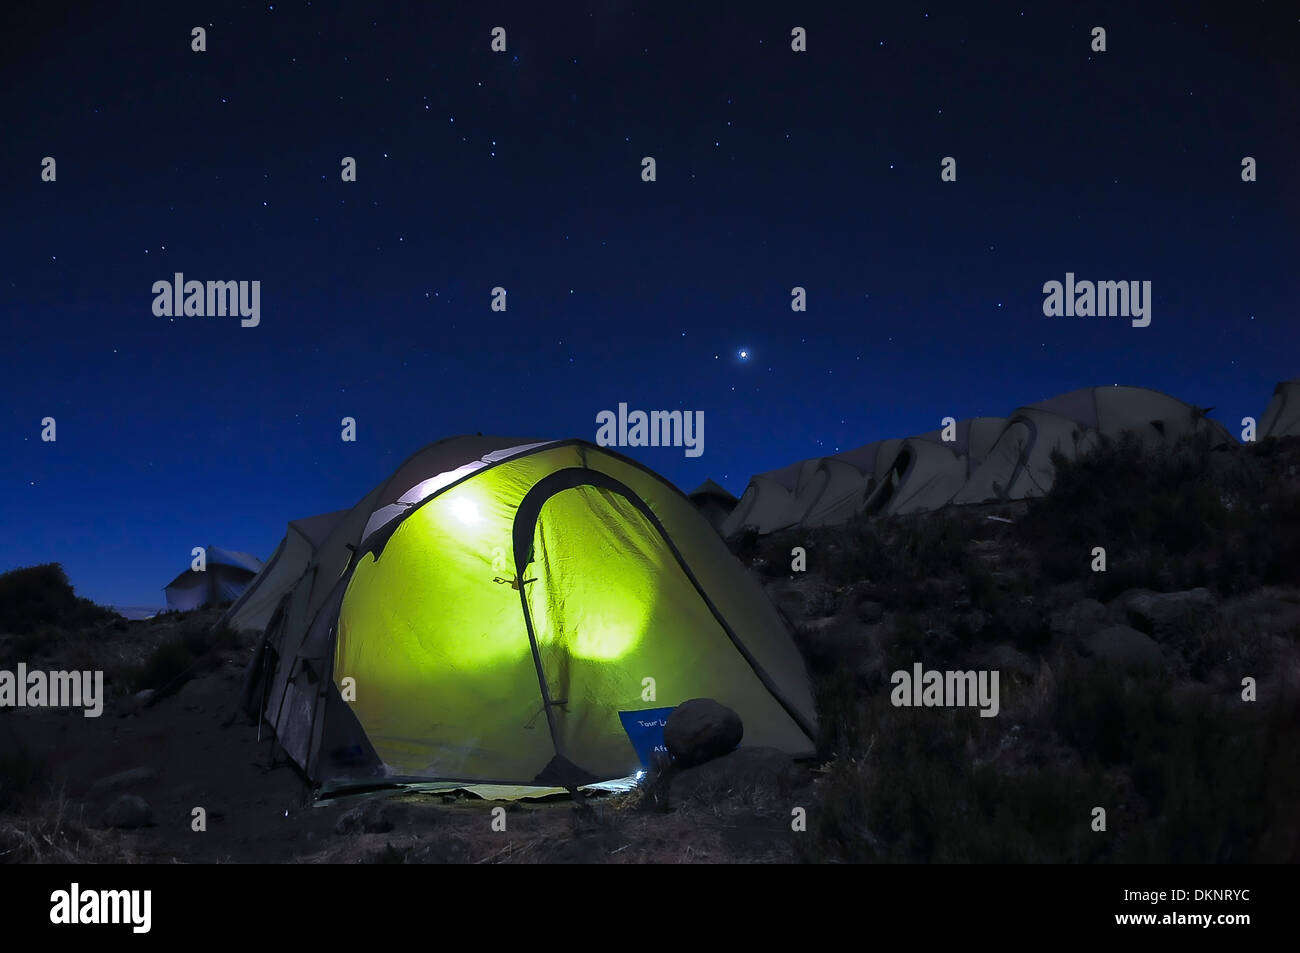 Horombo campsite on Marangu Route at night under the stars and milky way - Stock Image